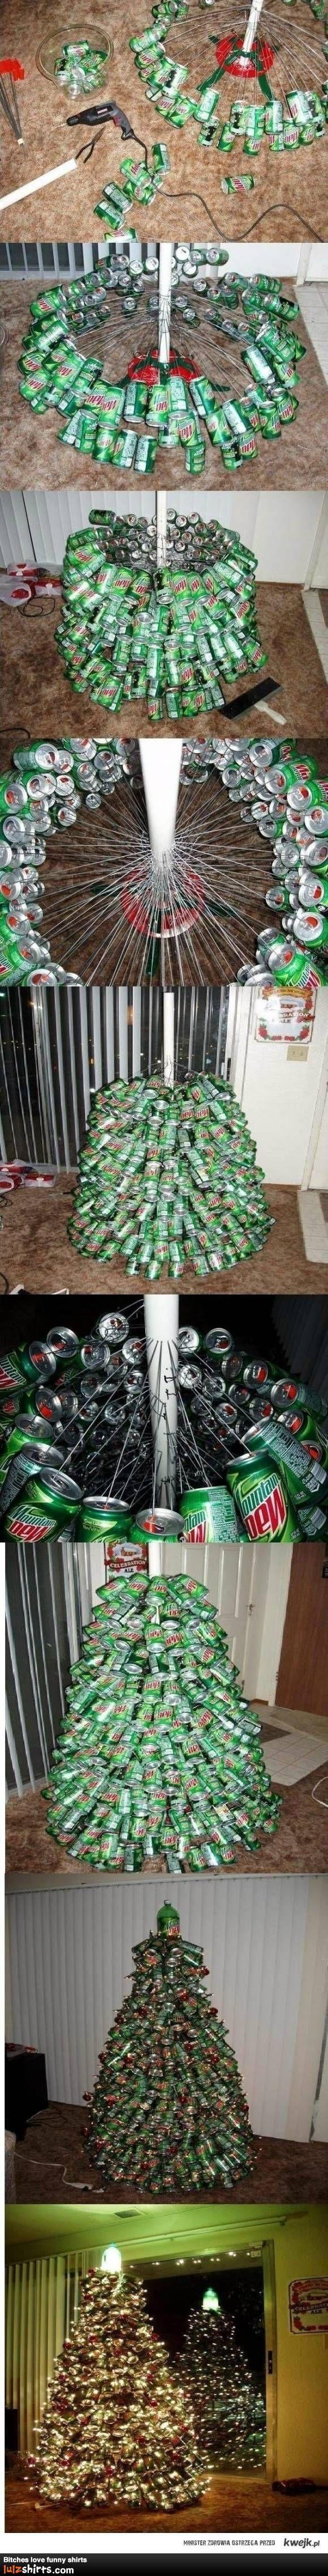 Mountain Dew Christmas Tree - Now that's some serious repurposing!